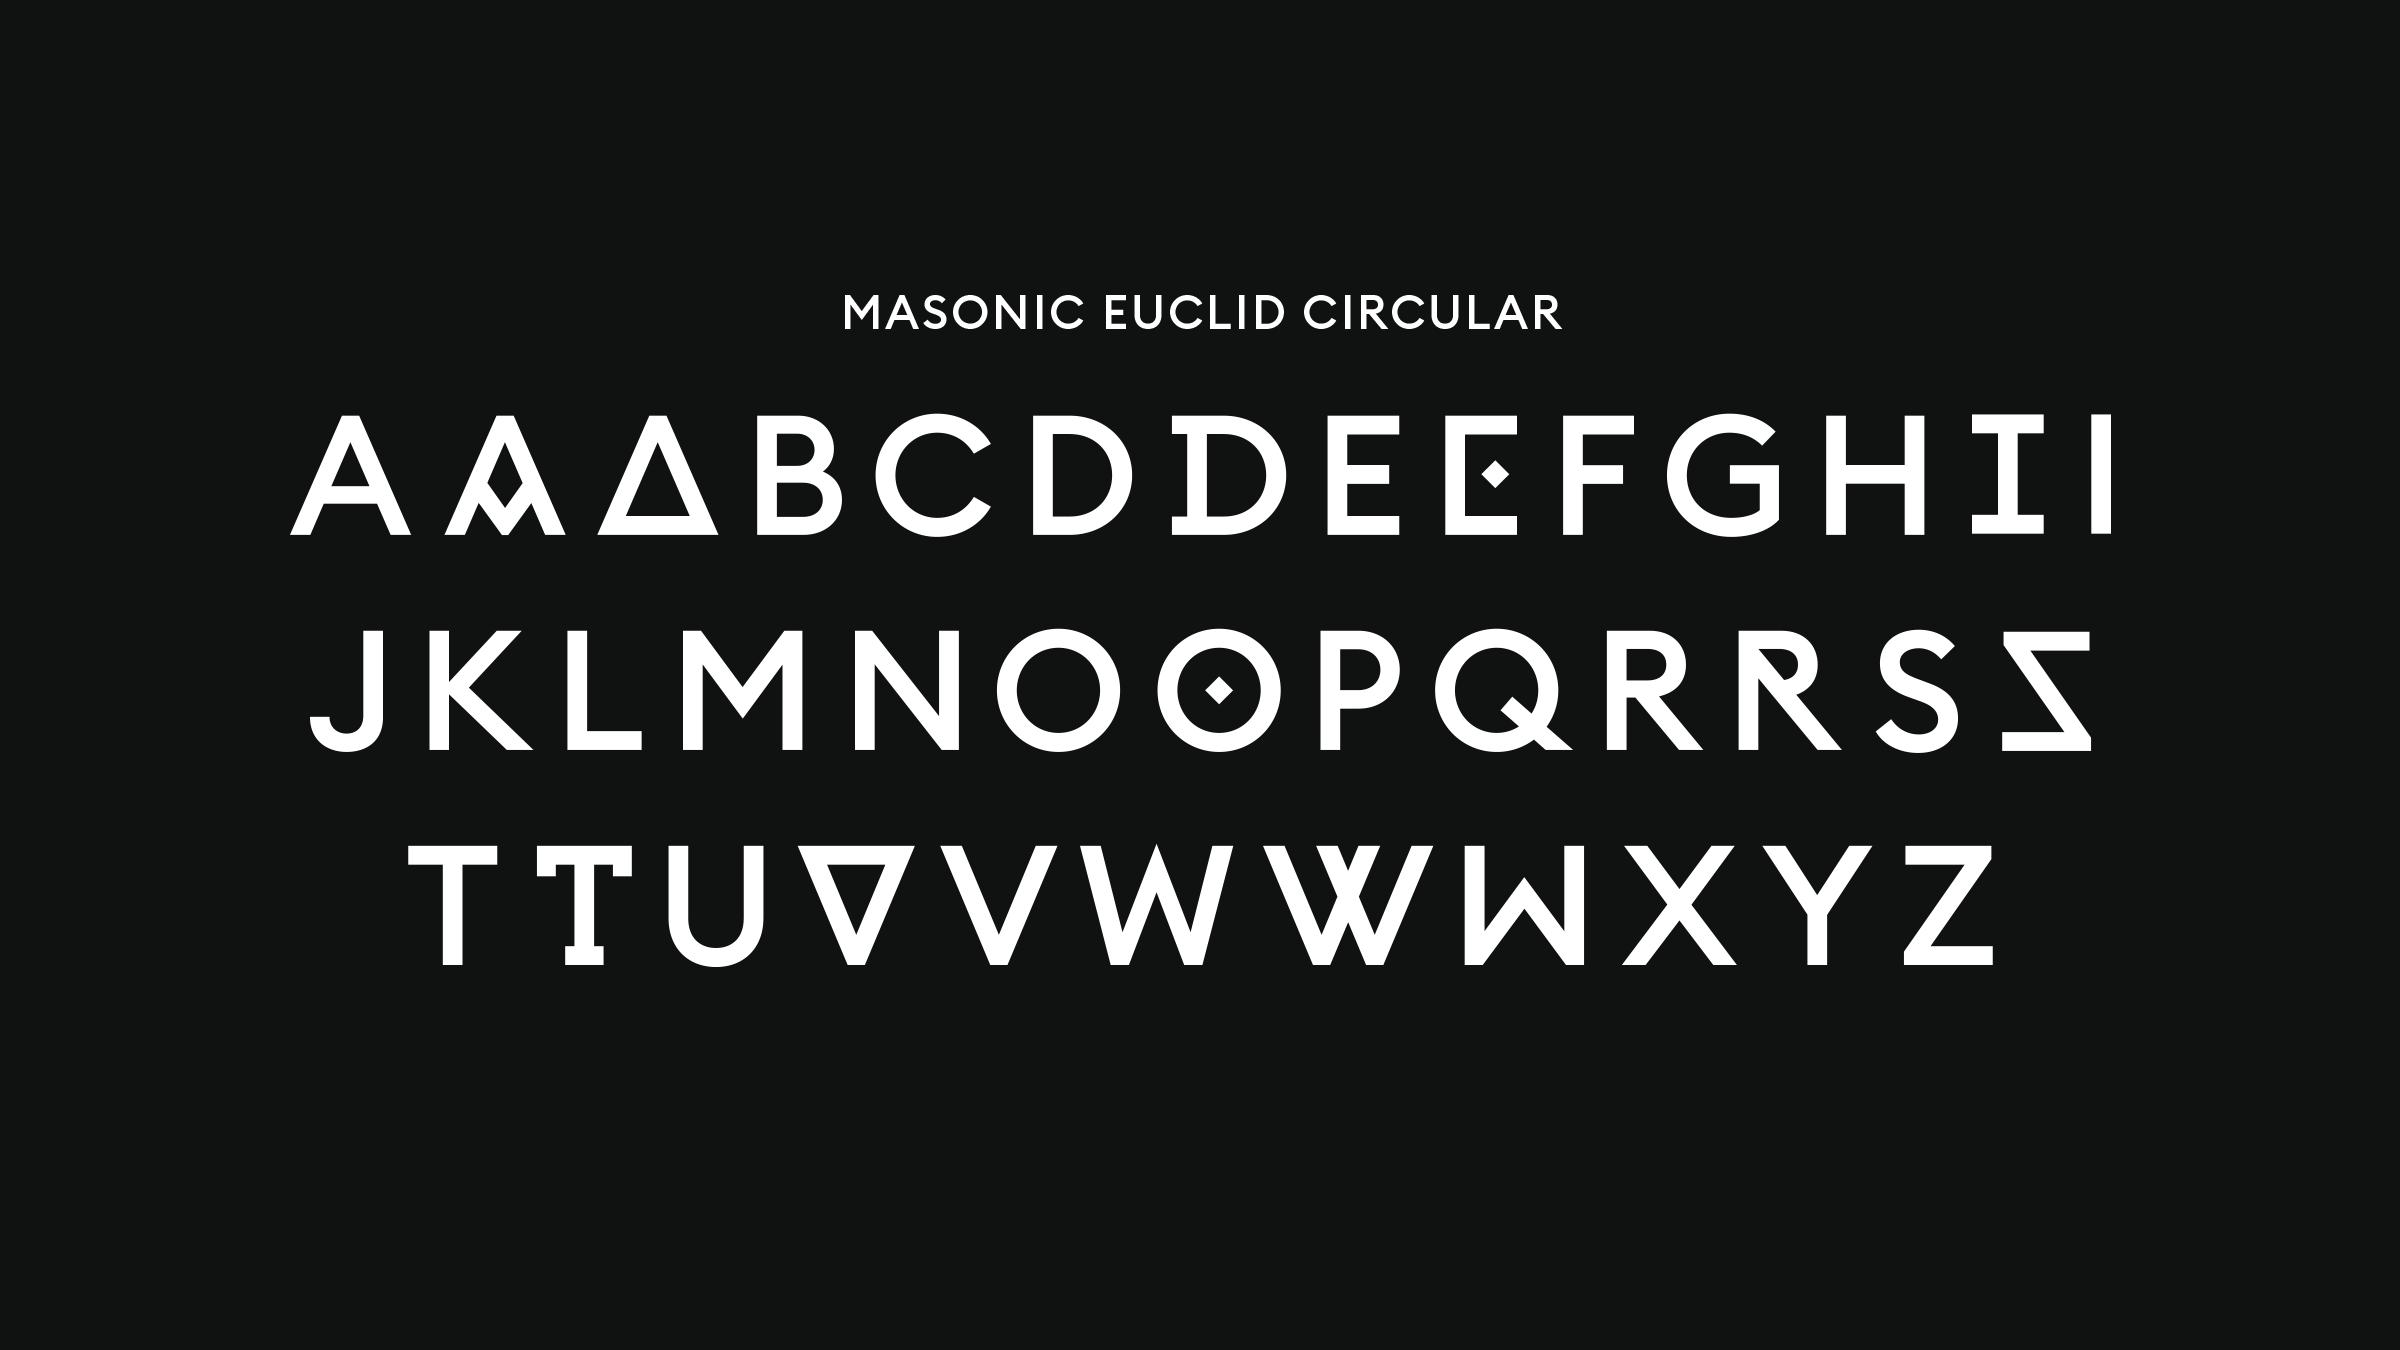 musuem-of-freemasonry-type-c-1-c